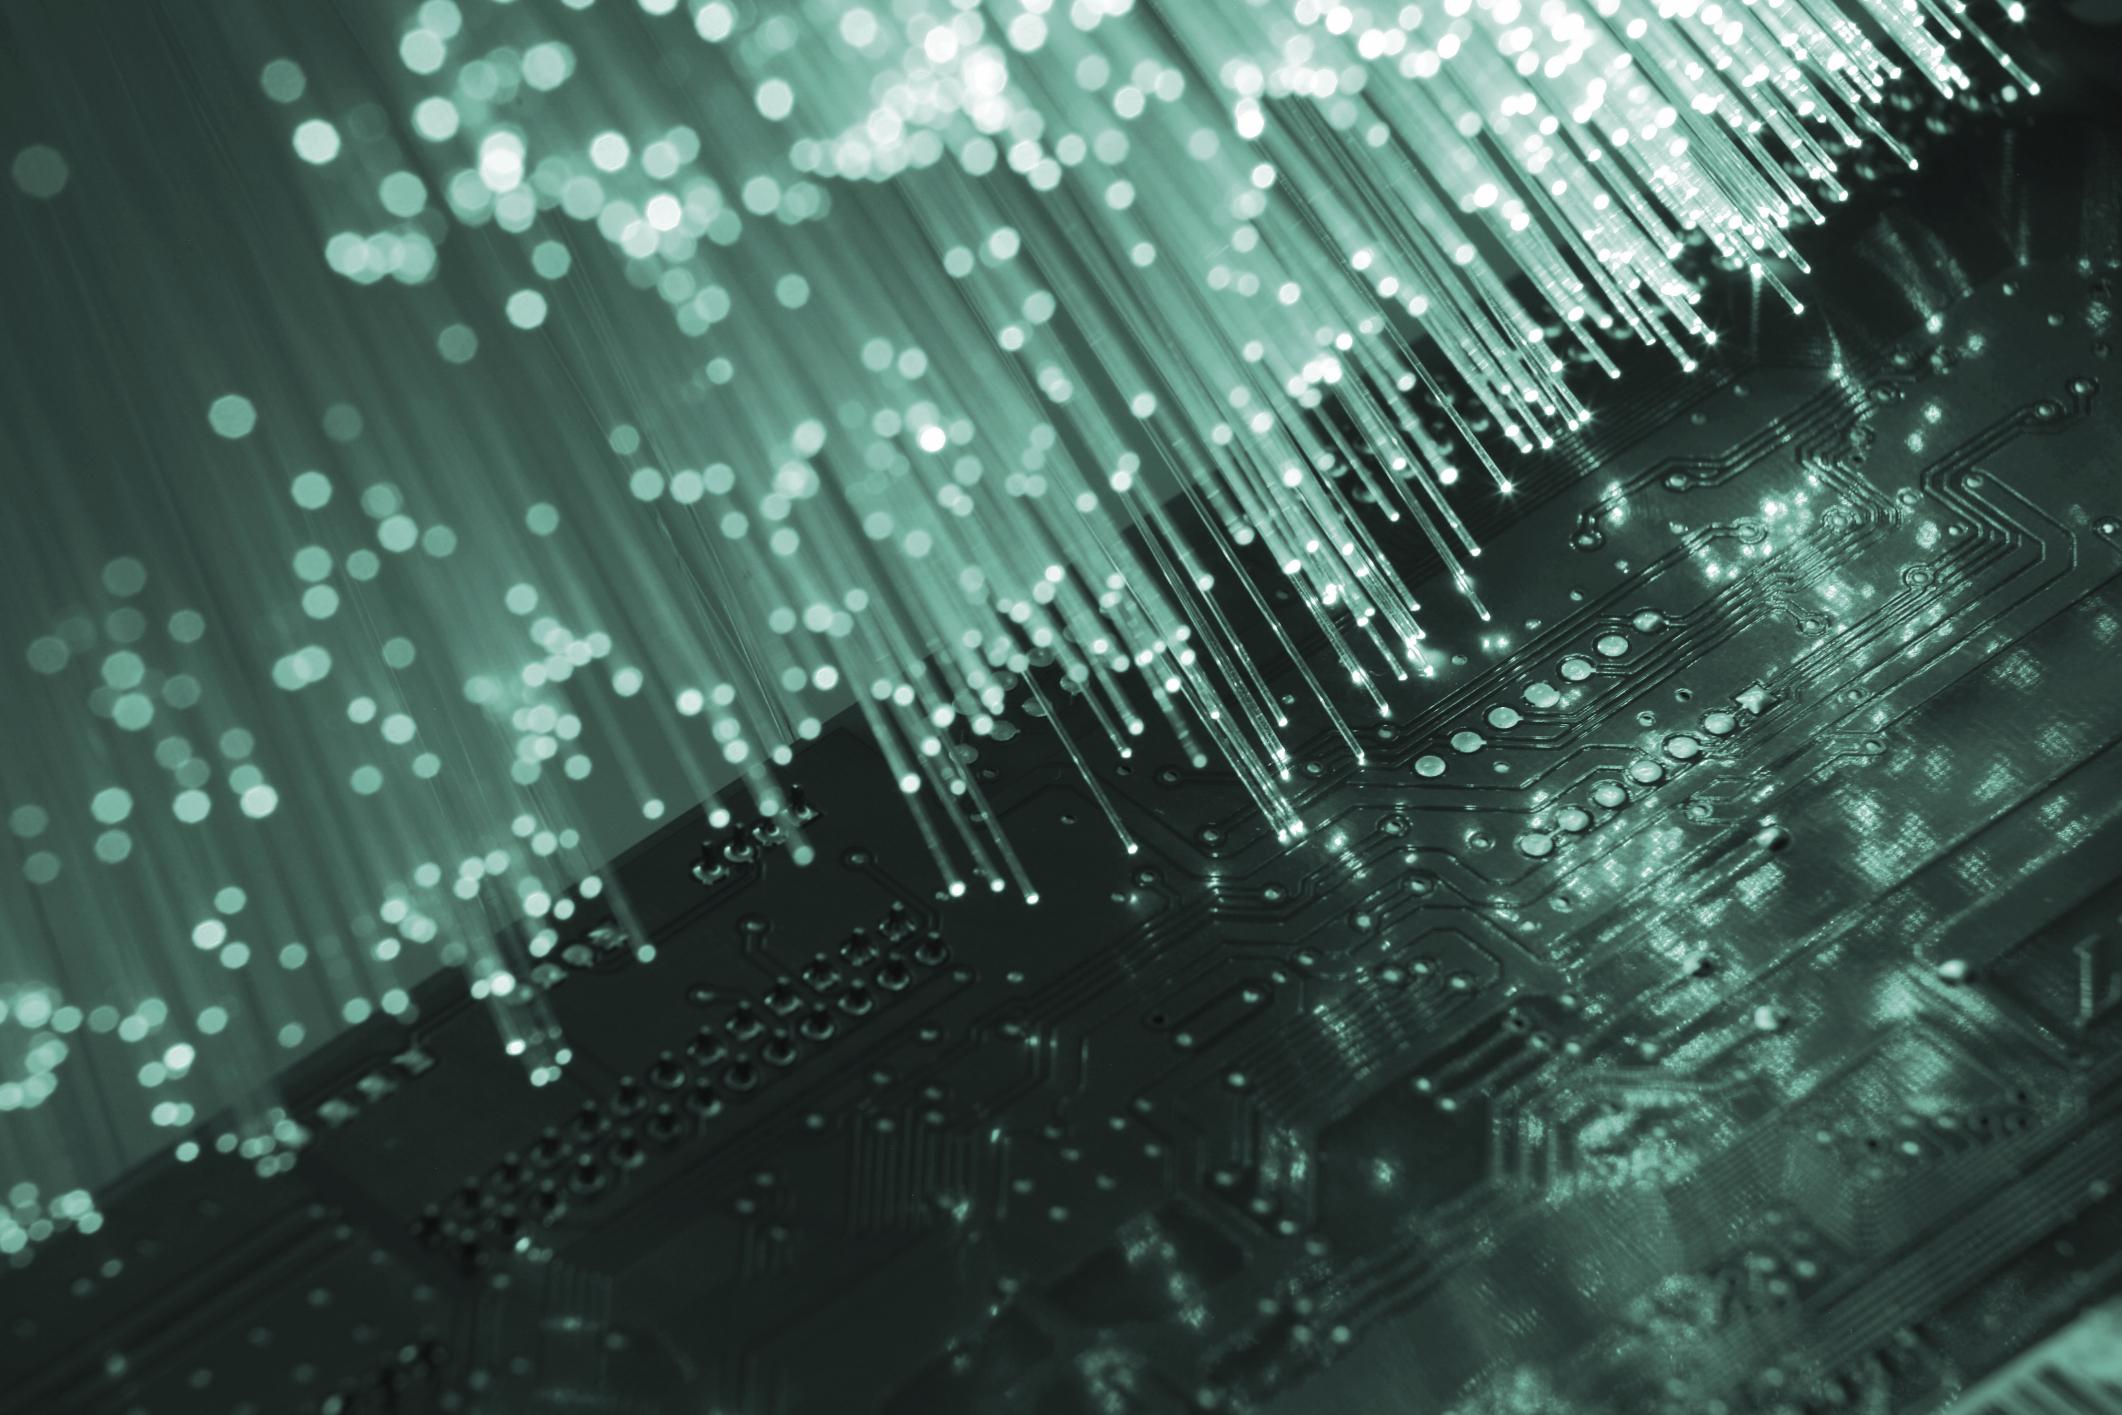 Cybercompli wallpaper hd dbc creative marketing agency - Cyber wallpaper ...